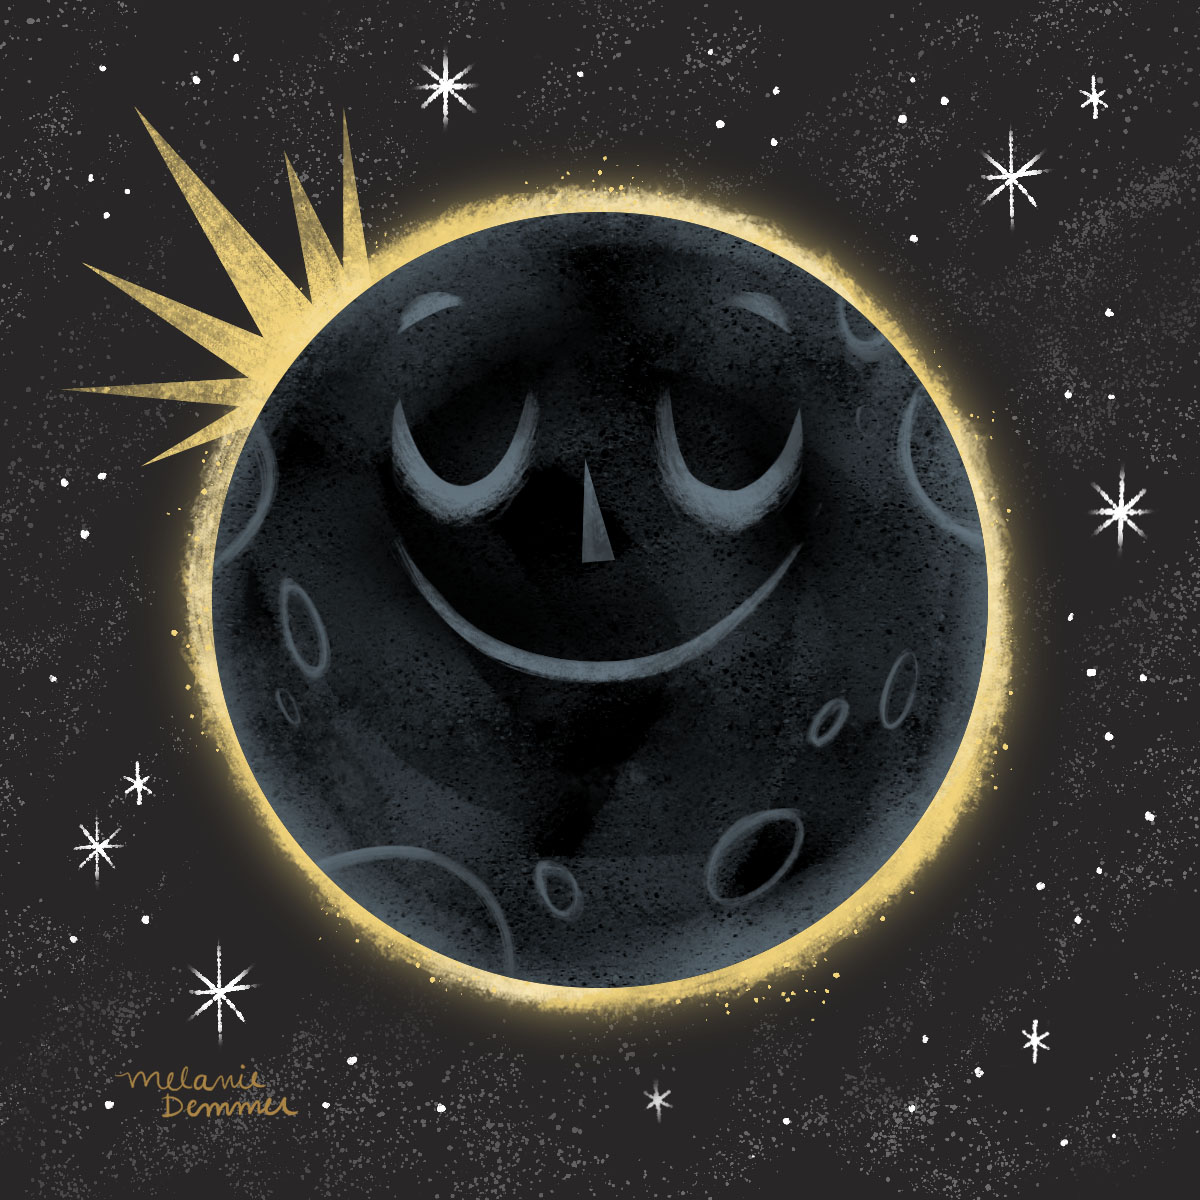 solar_eclipse_mdemmer.jpg